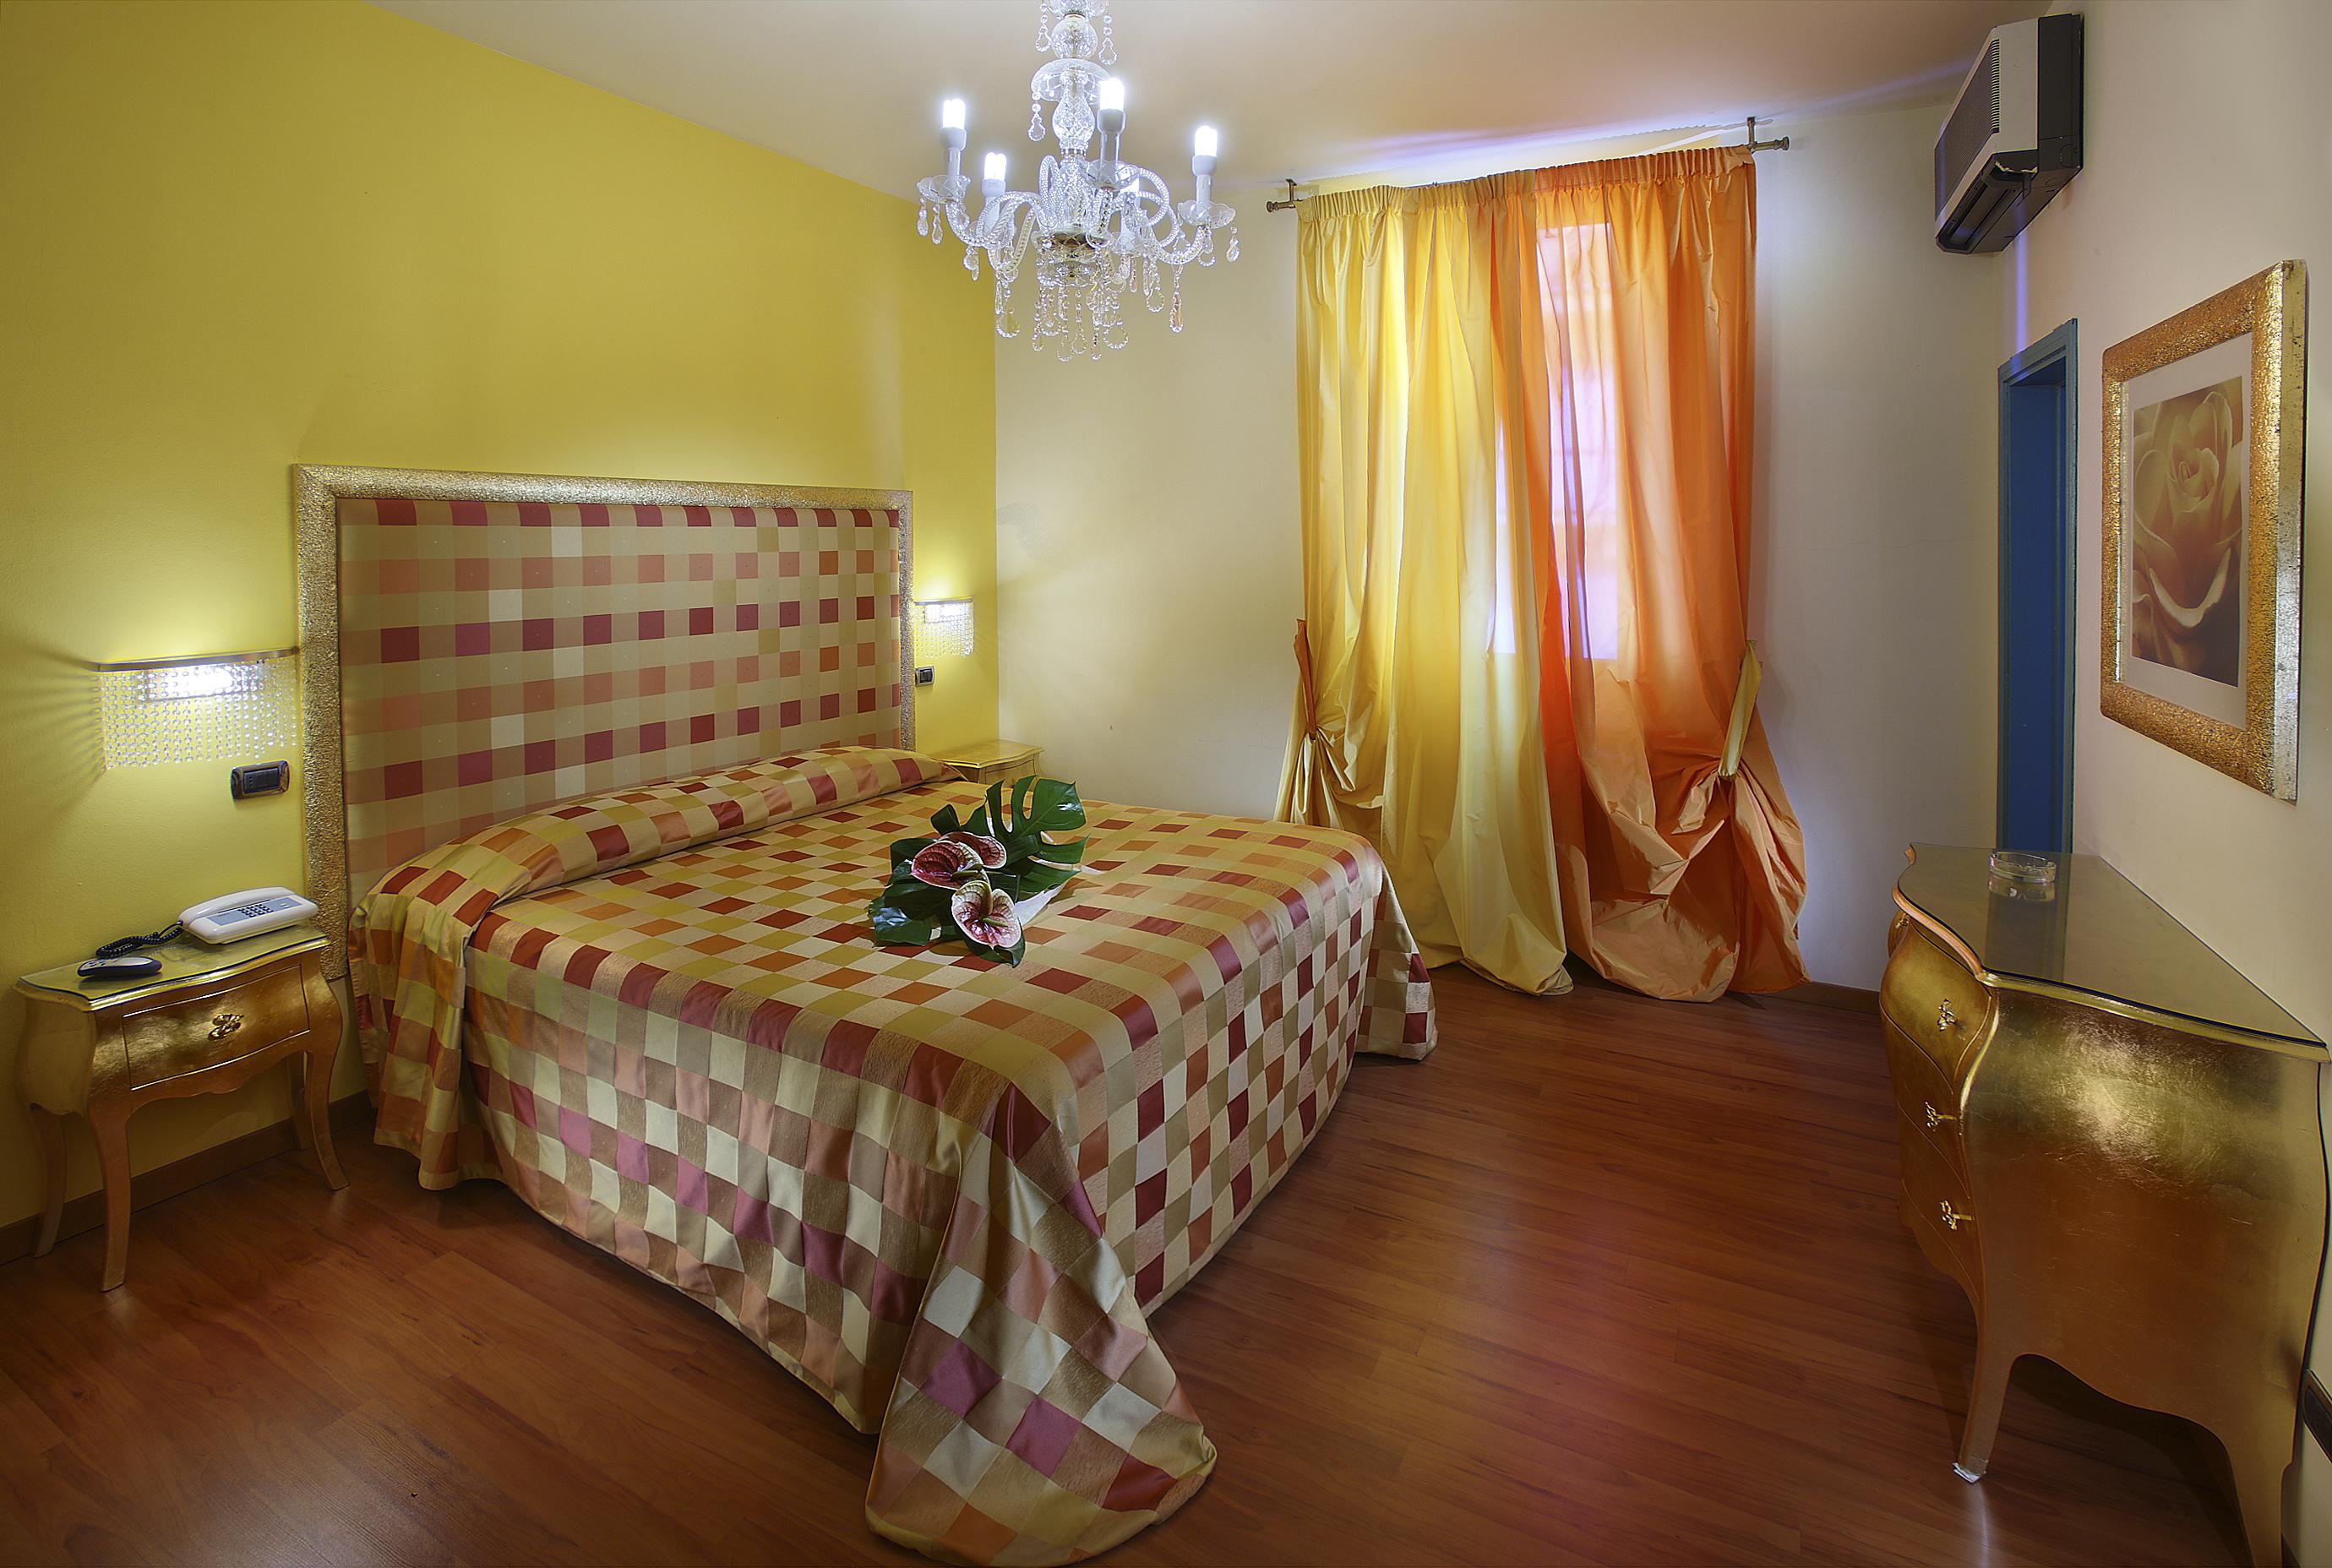 Hotel Nuevo Savi, Montecatini Terme